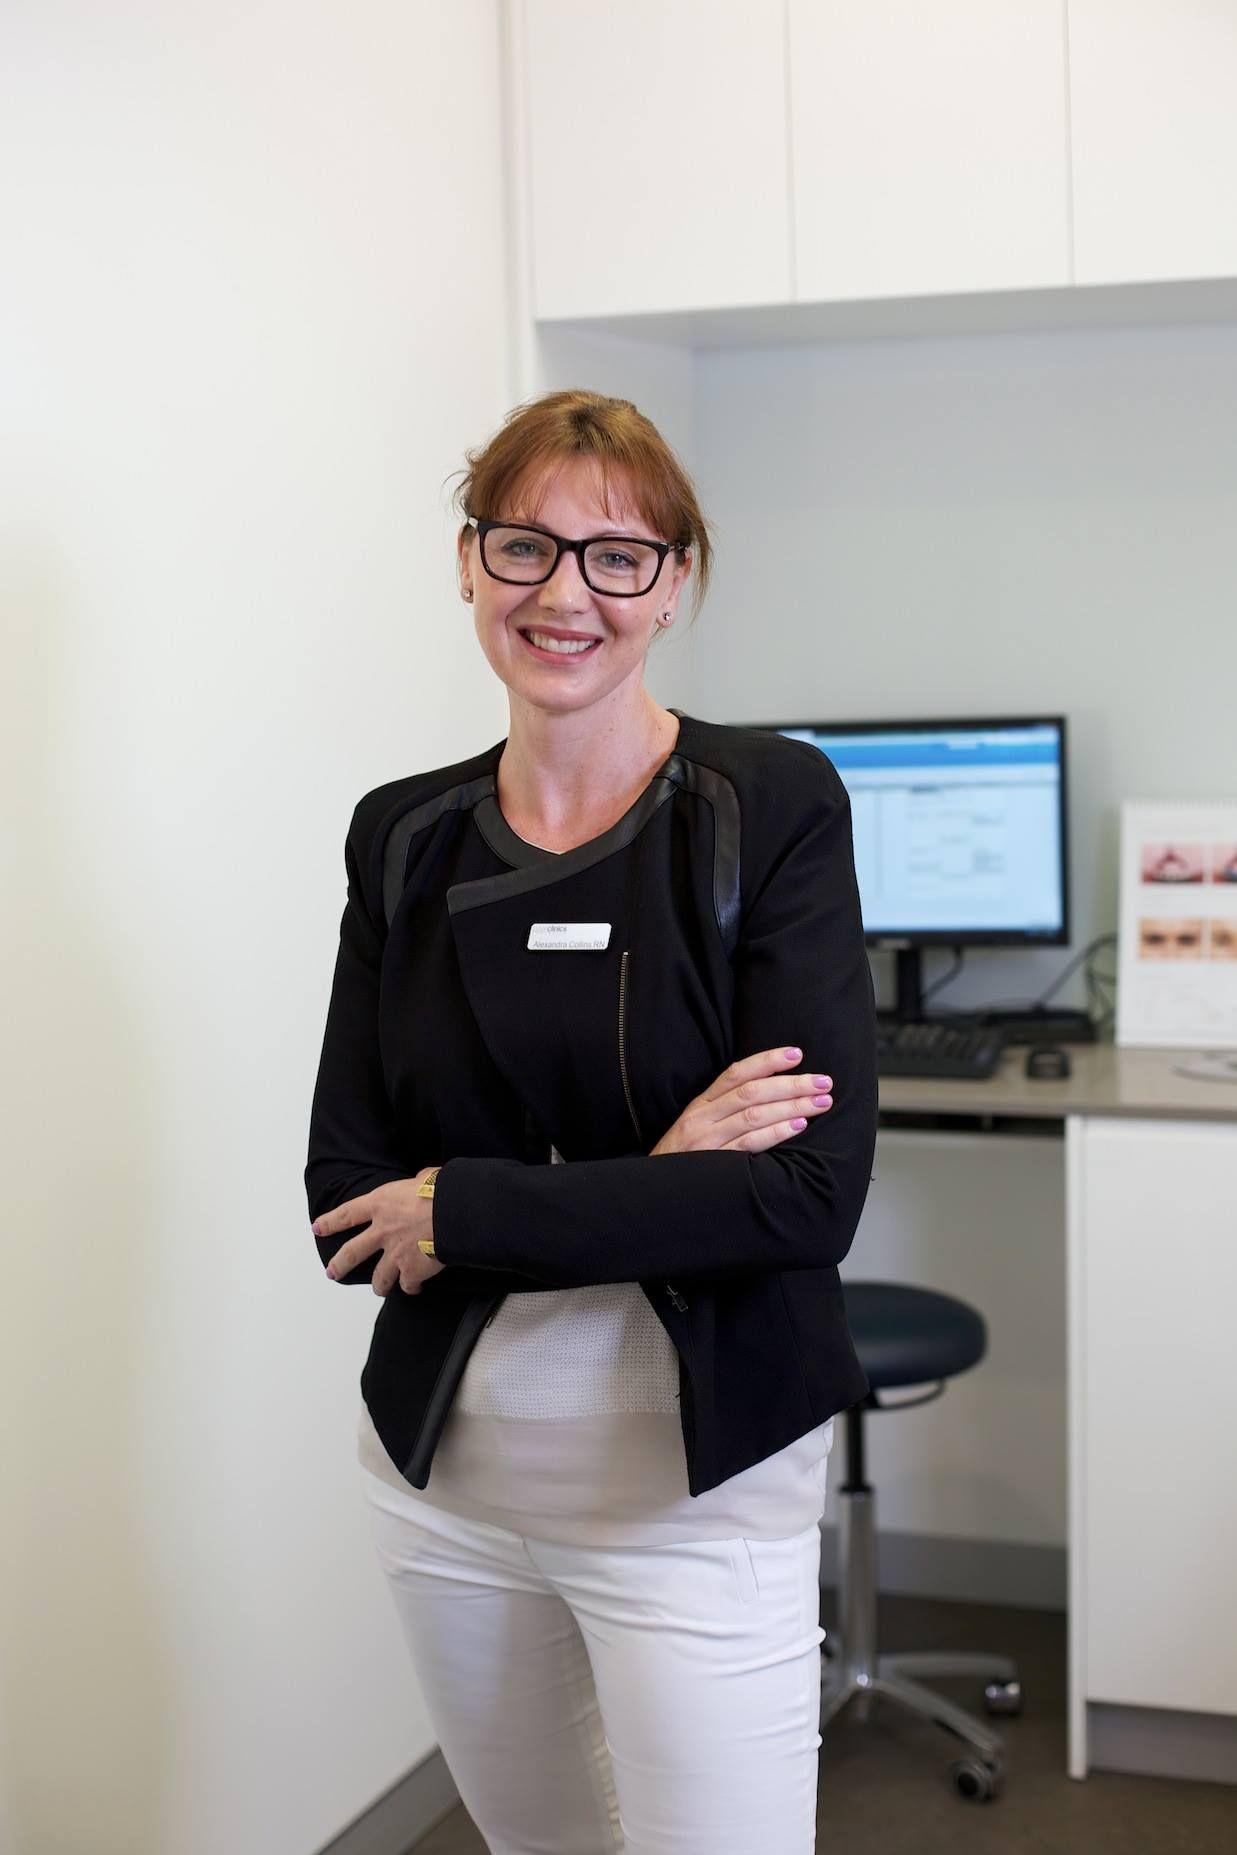 Pin by Laser Clinics Australia on Team LCA | Laser clinics